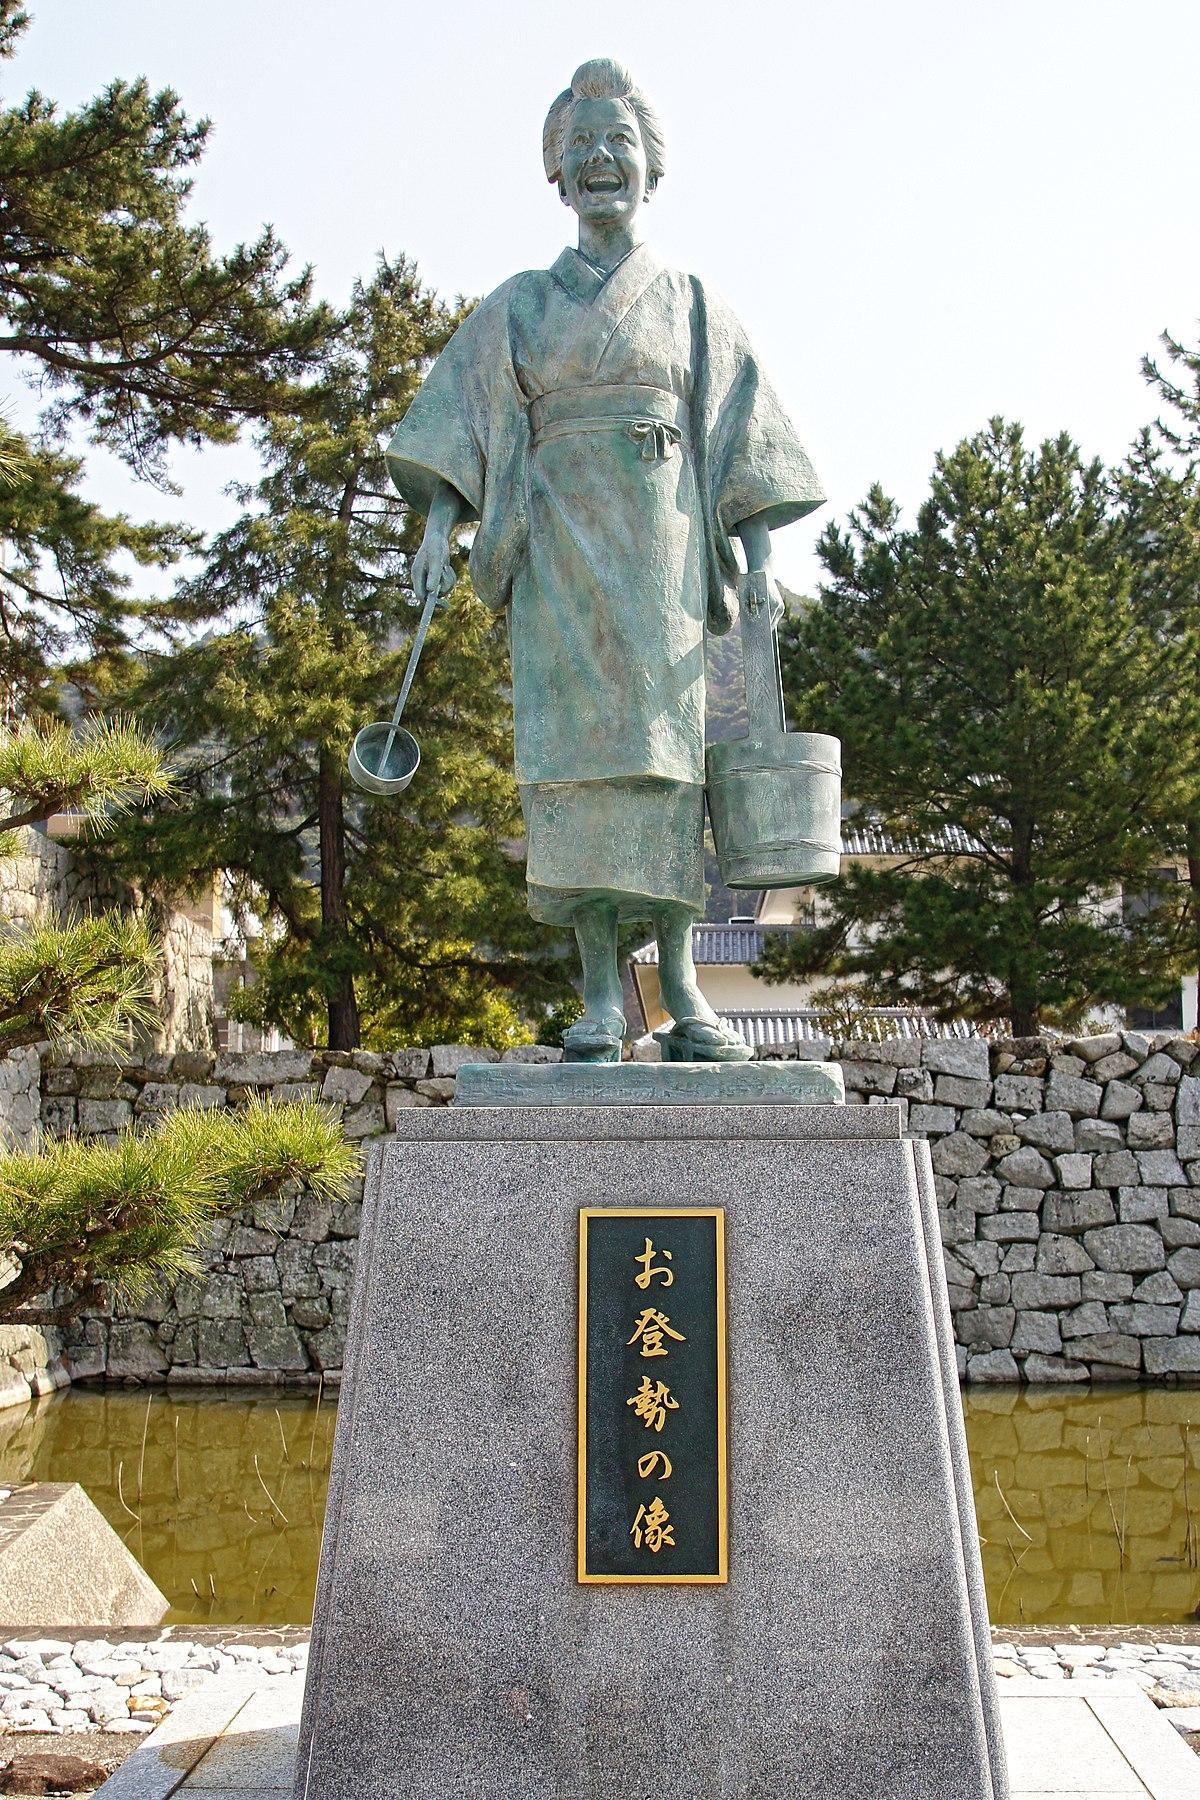 Sumtomo Municipal Awajishima Museum Sumoto Hyogo pref Japan03n.jpg